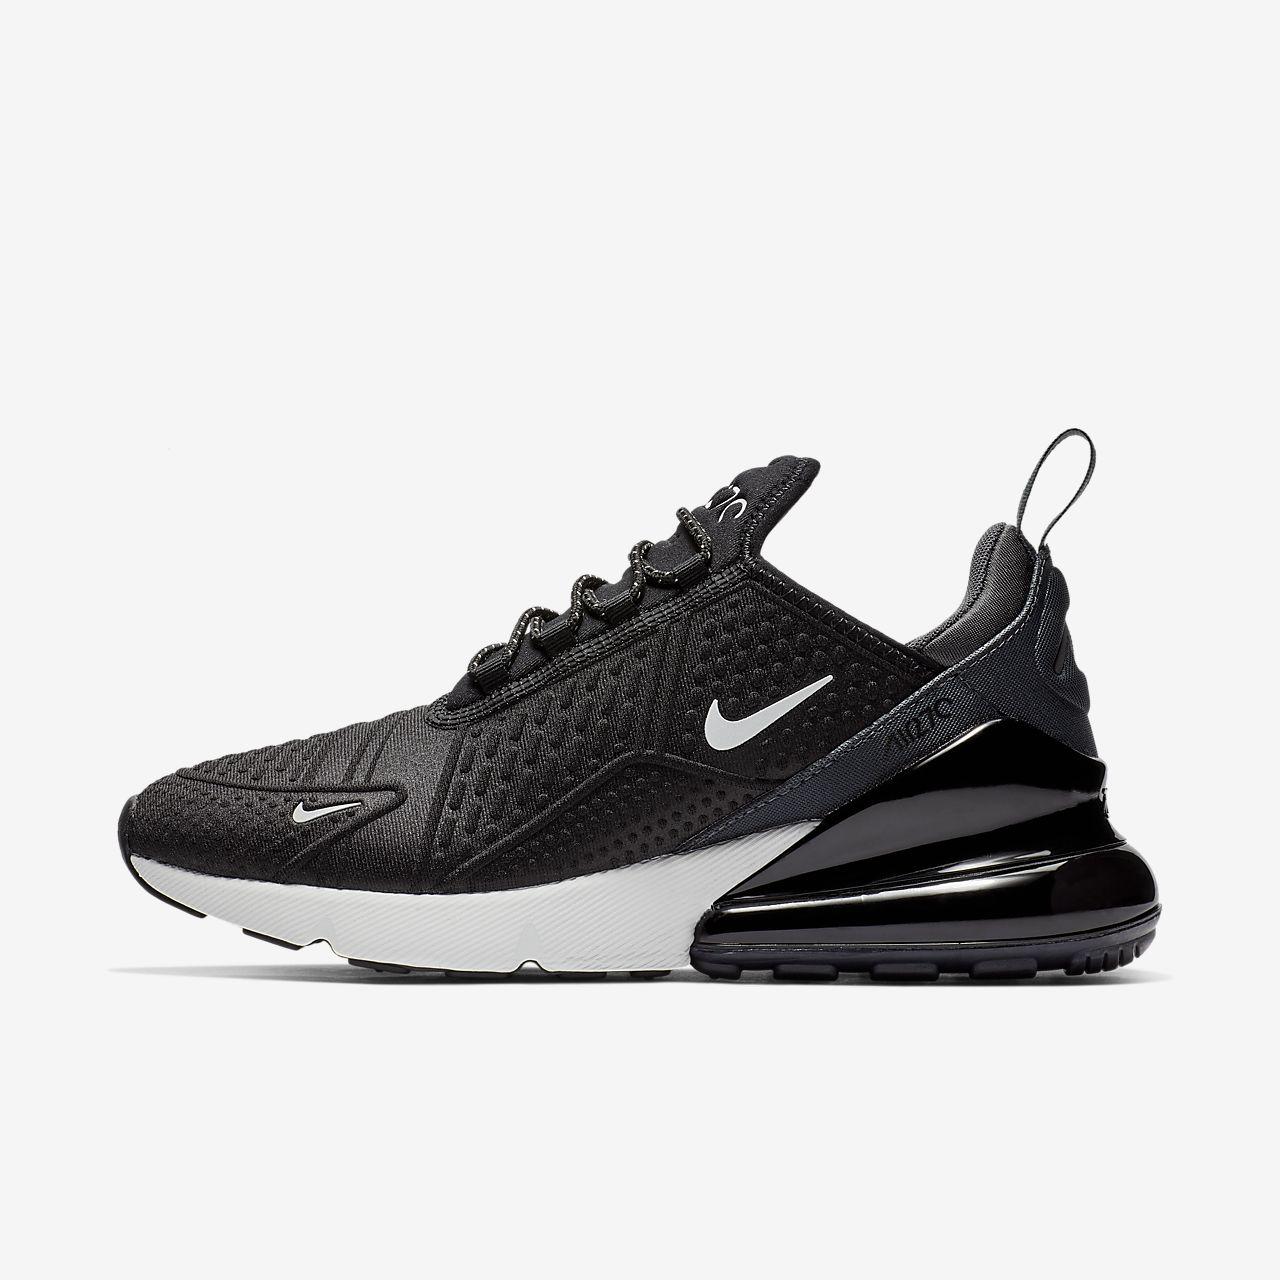 Chaussure Nike Air Max 270 SE pour Femme